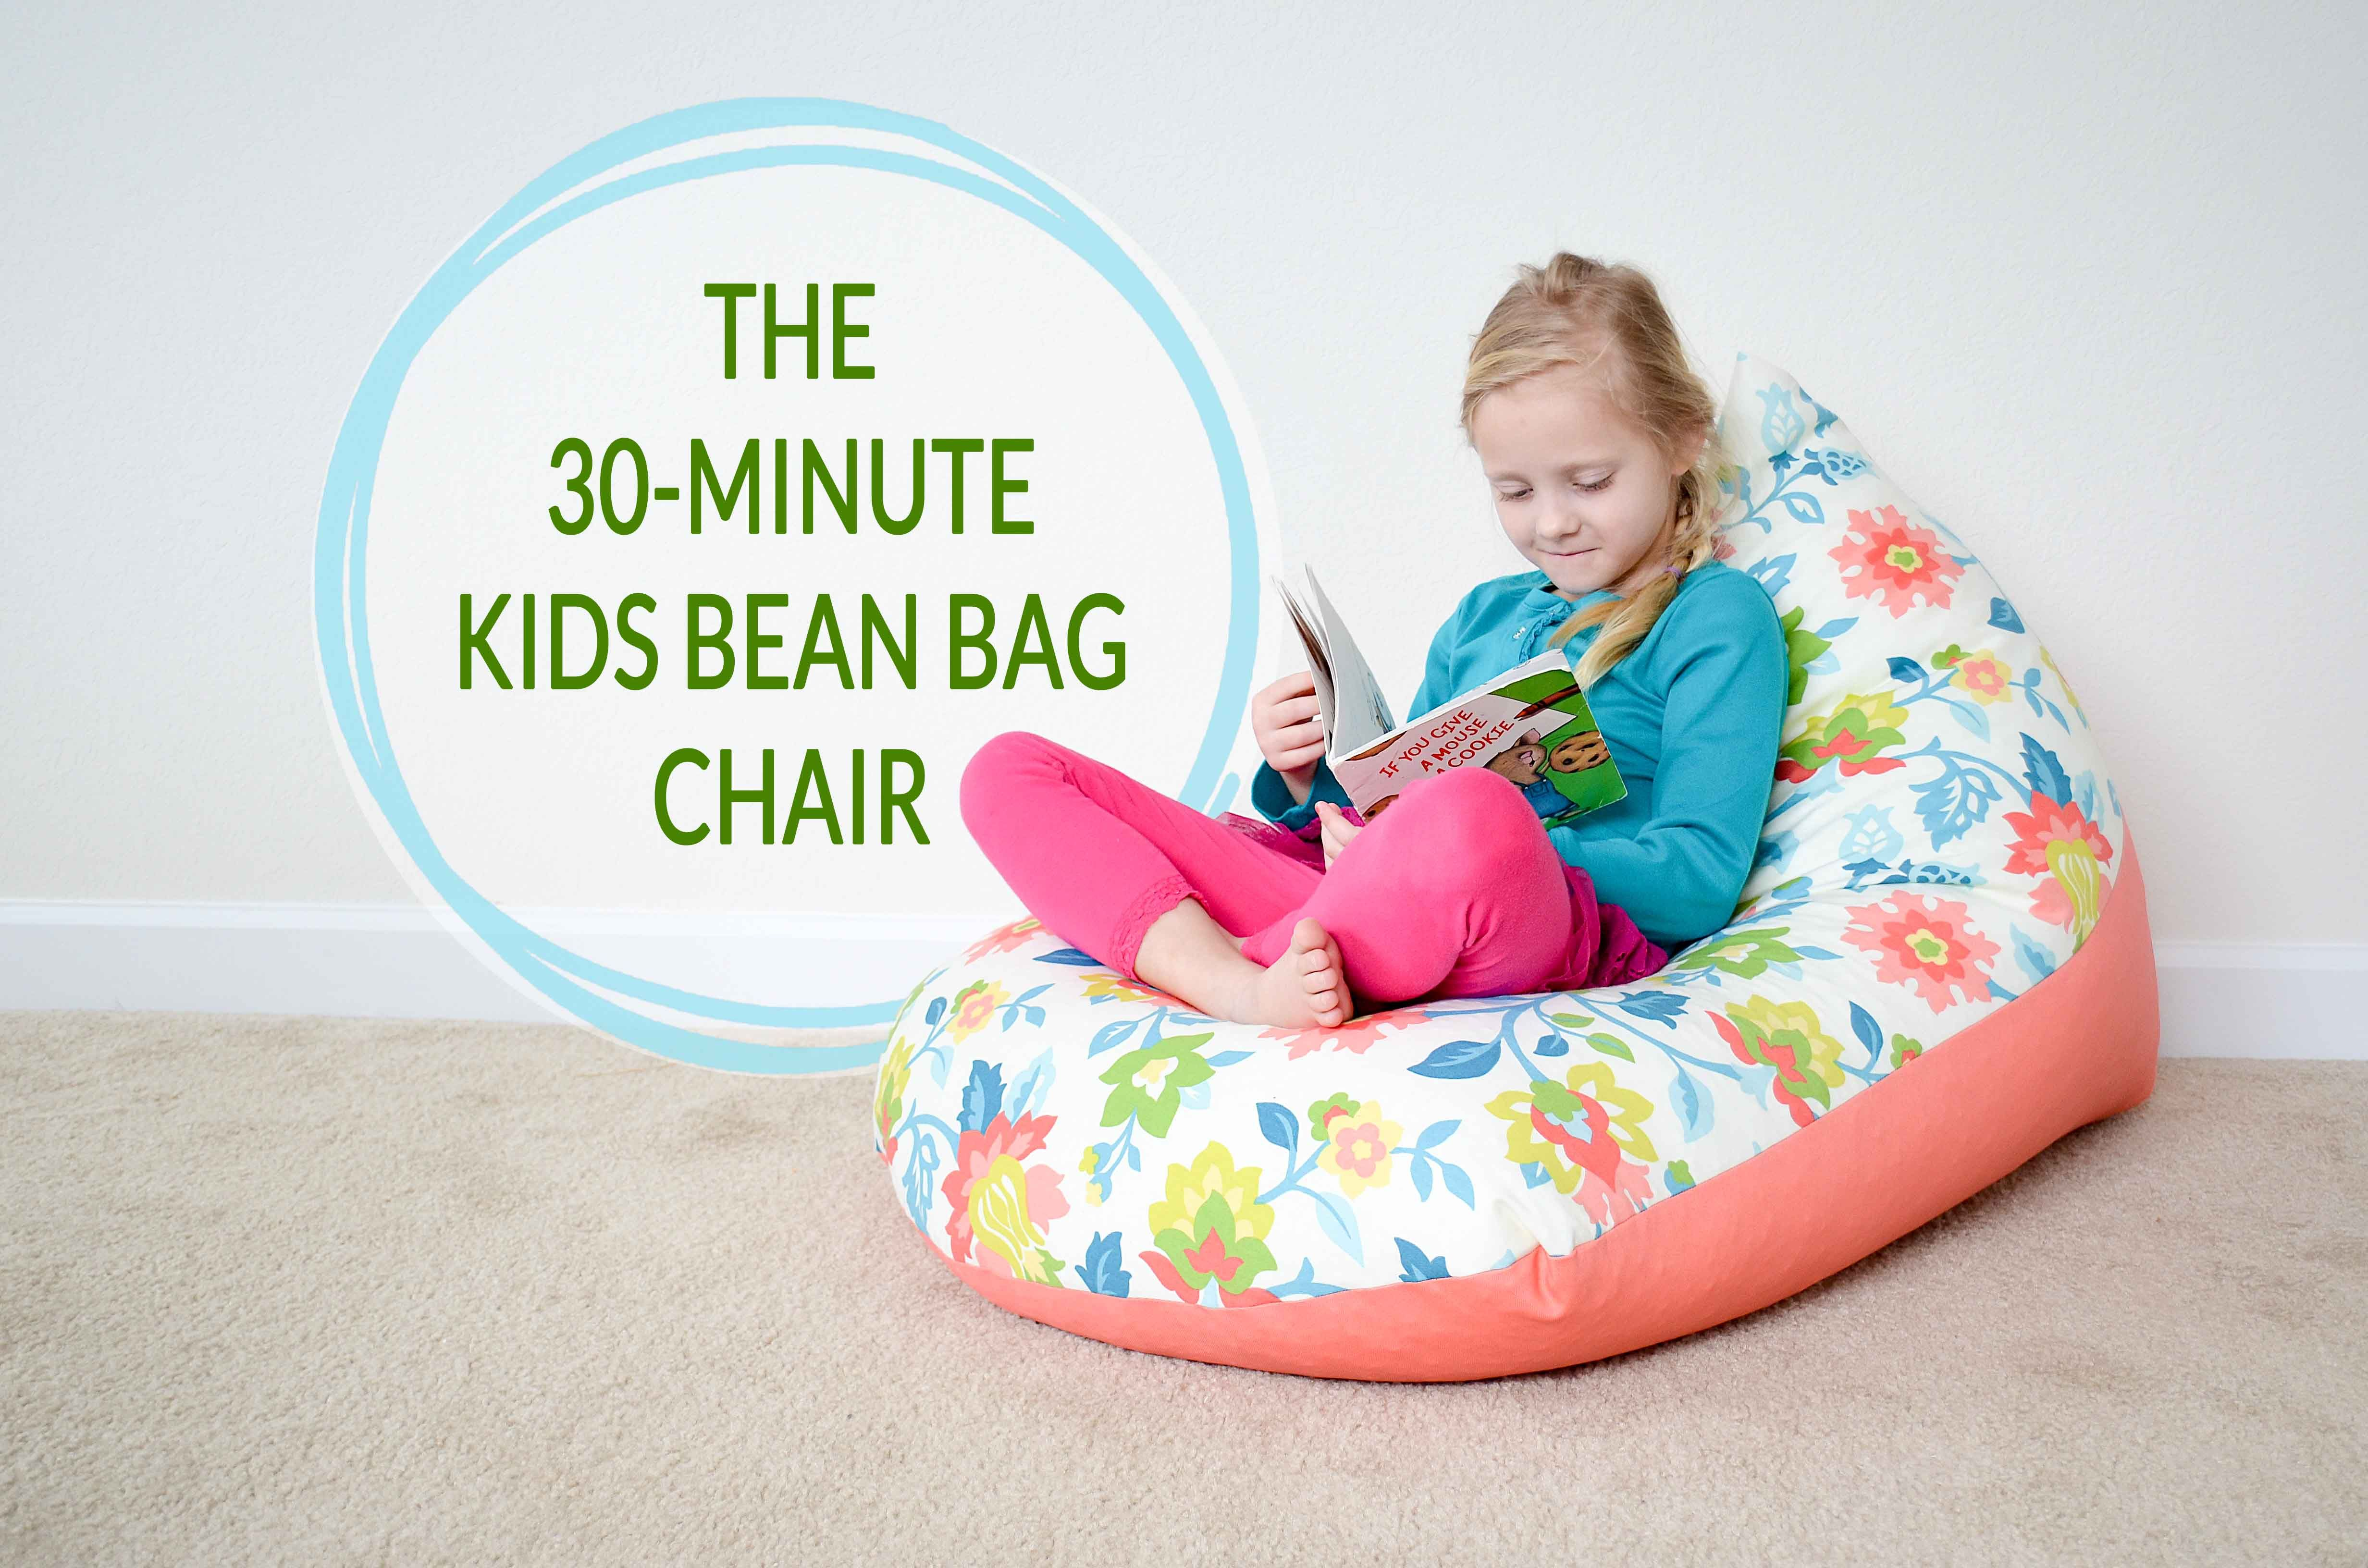 Peachy Diy Sew A Kids Bean Bag Chair In 30 Minutes Floor Pillows Caraccident5 Cool Chair Designs And Ideas Caraccident5Info